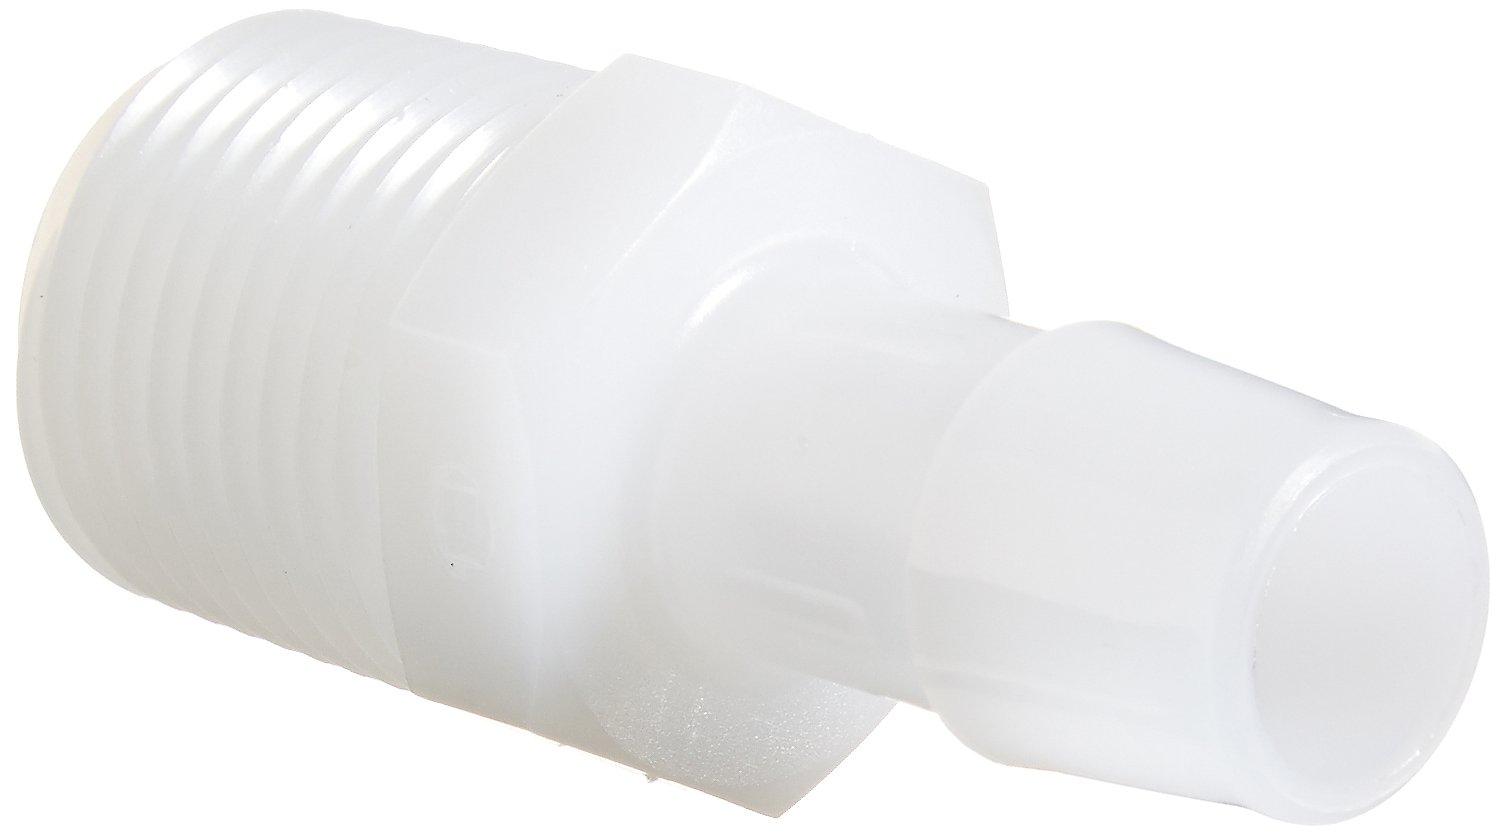 Eldon James A8-8HDPE High Density Polyethylene Adapter Fitting, 1/2-14 NPT to 1/2'' Hose Barb (Pack of 10) by Eldon James